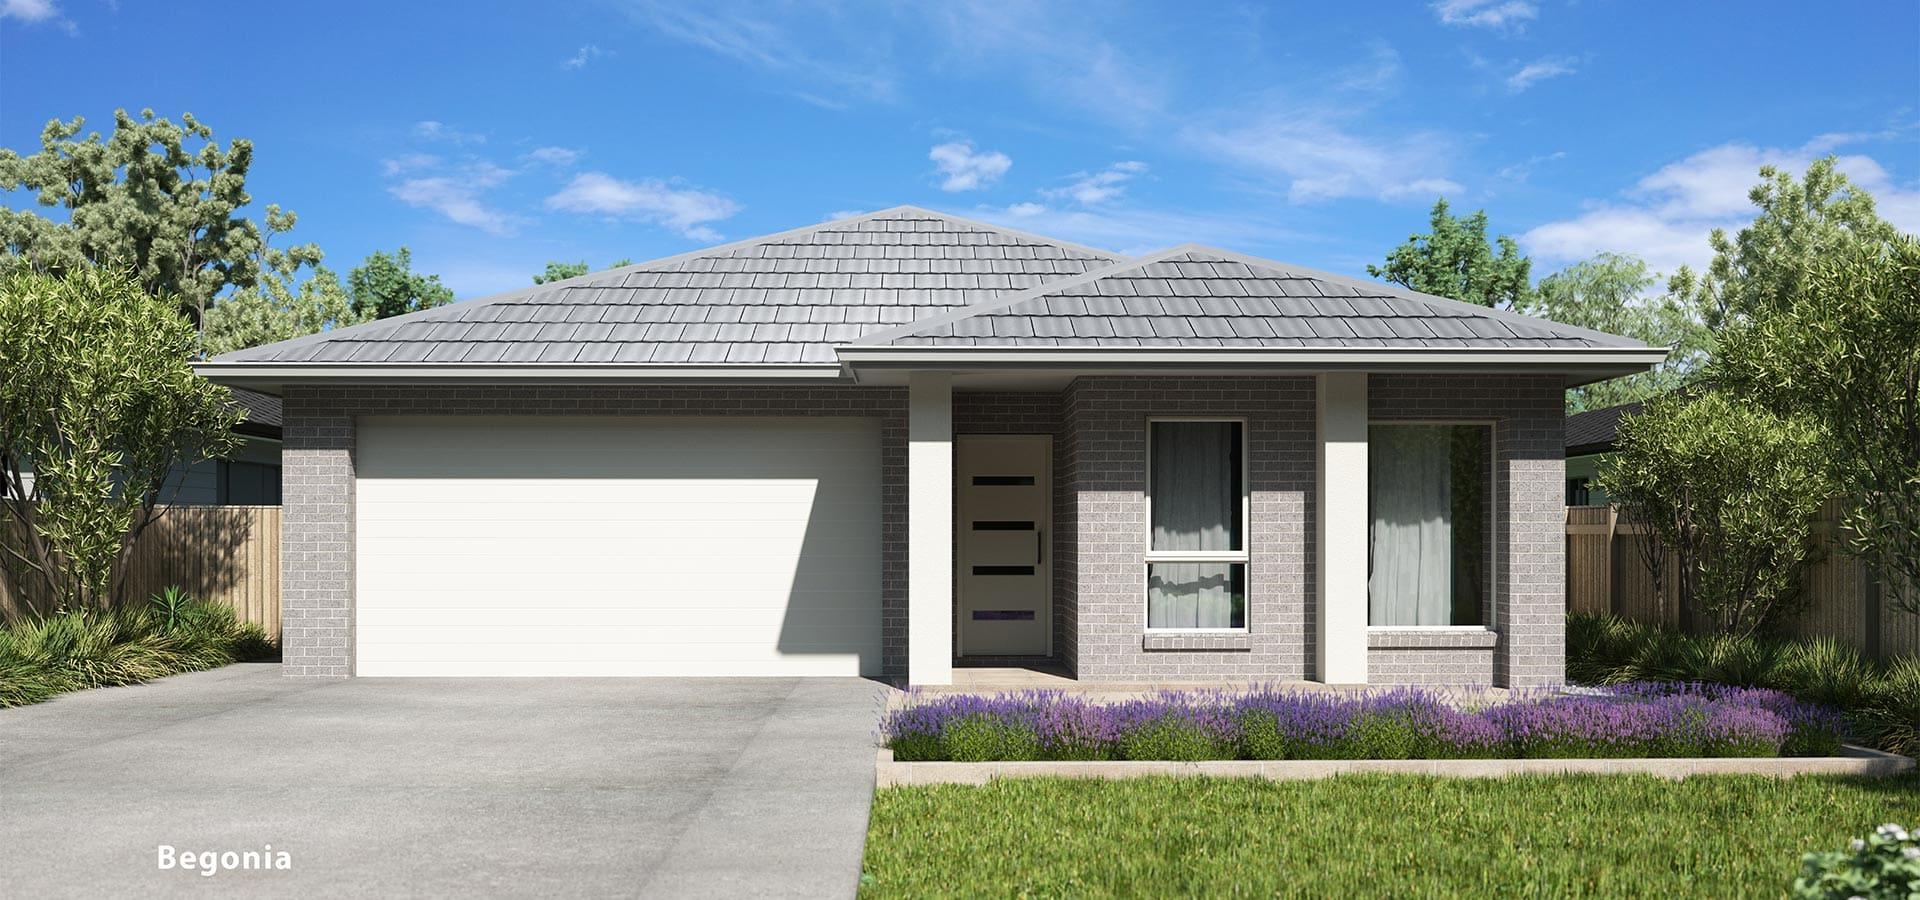 Begonia-12-13-Y-Single-House-Design